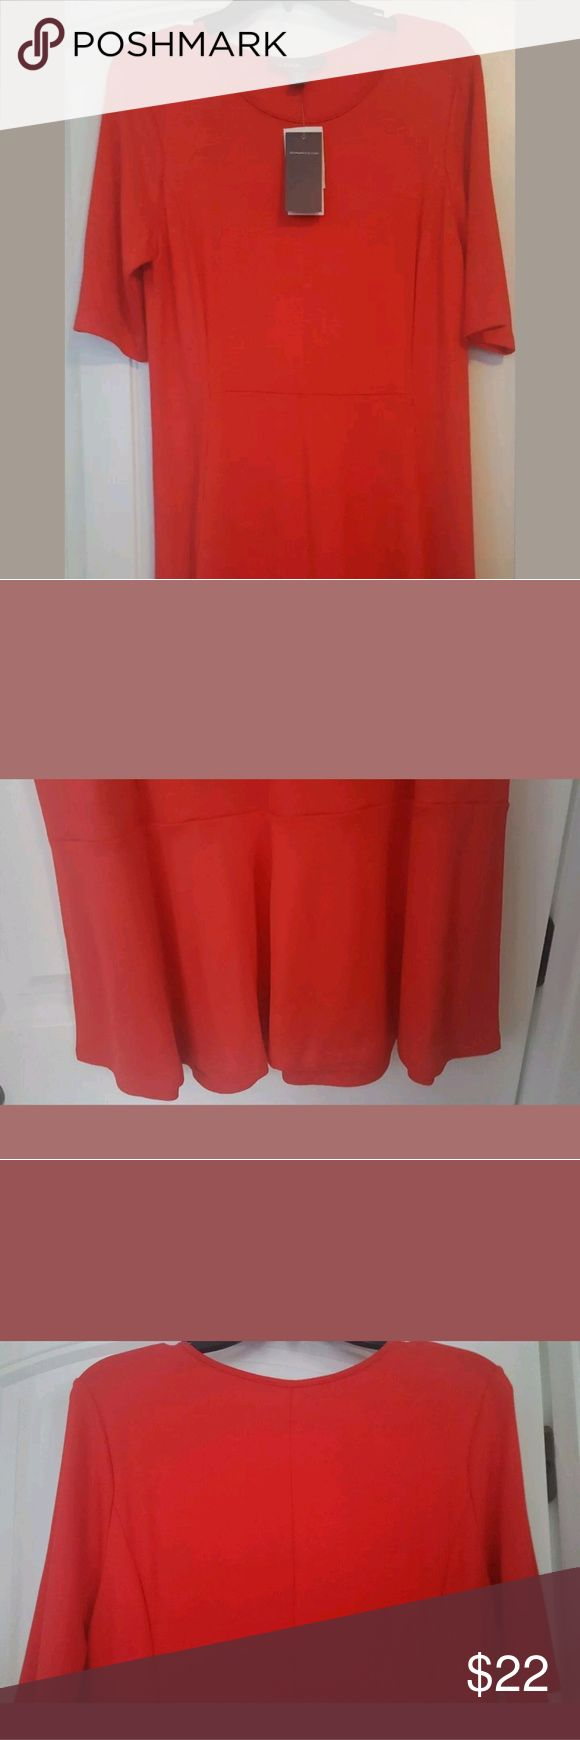 Donna Ricco Womens Dress Donna Ricco Red Skater Dress - Size L - 3/4 Sleeve - Comfy - Dress Up/Down -   Flirty/Flare Donna Ricco Dresses